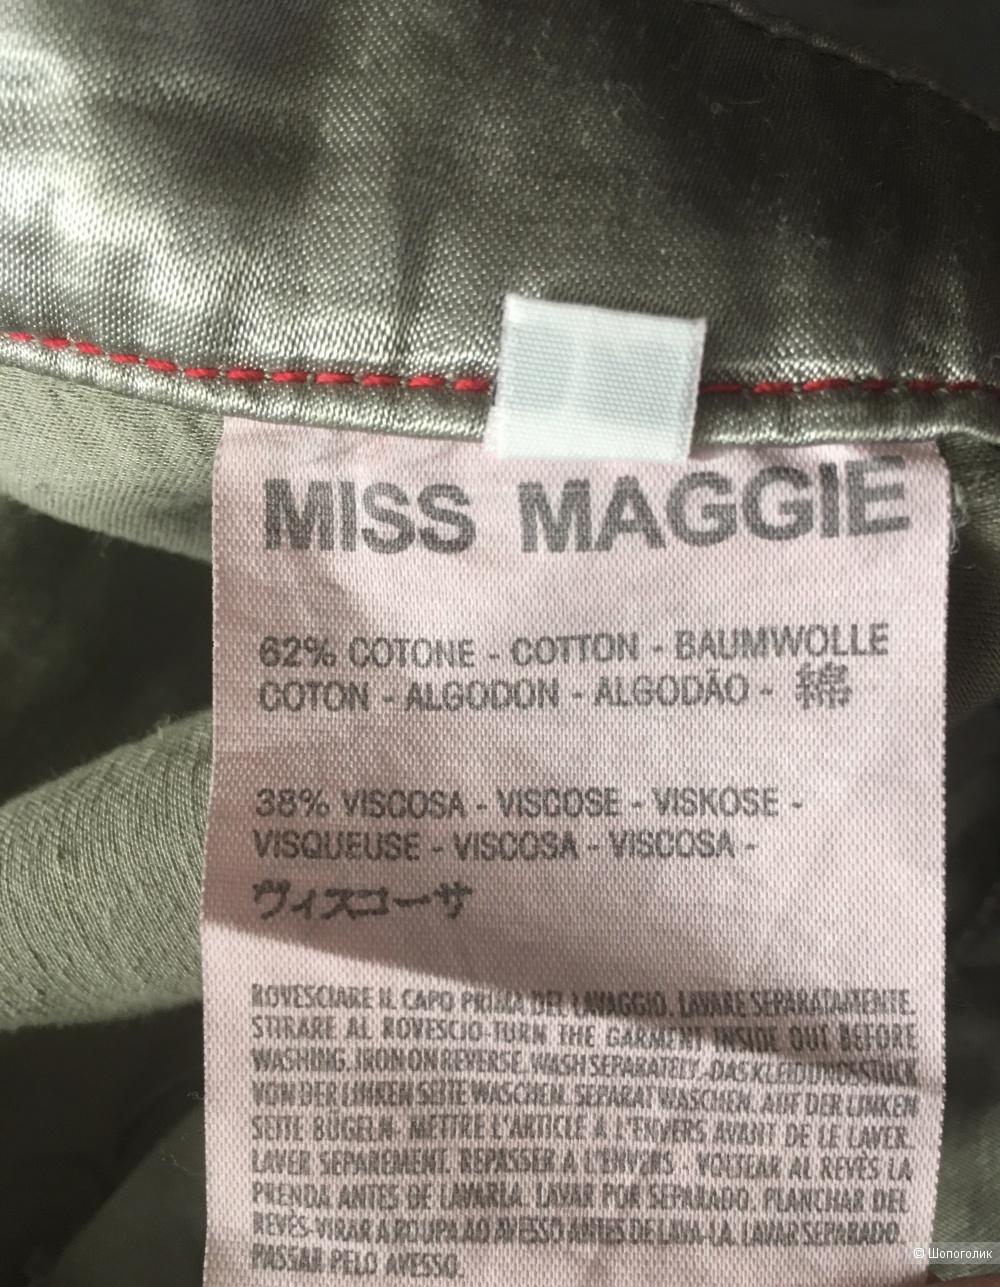 Брюки с лампасами Miss Maggie размер L 48